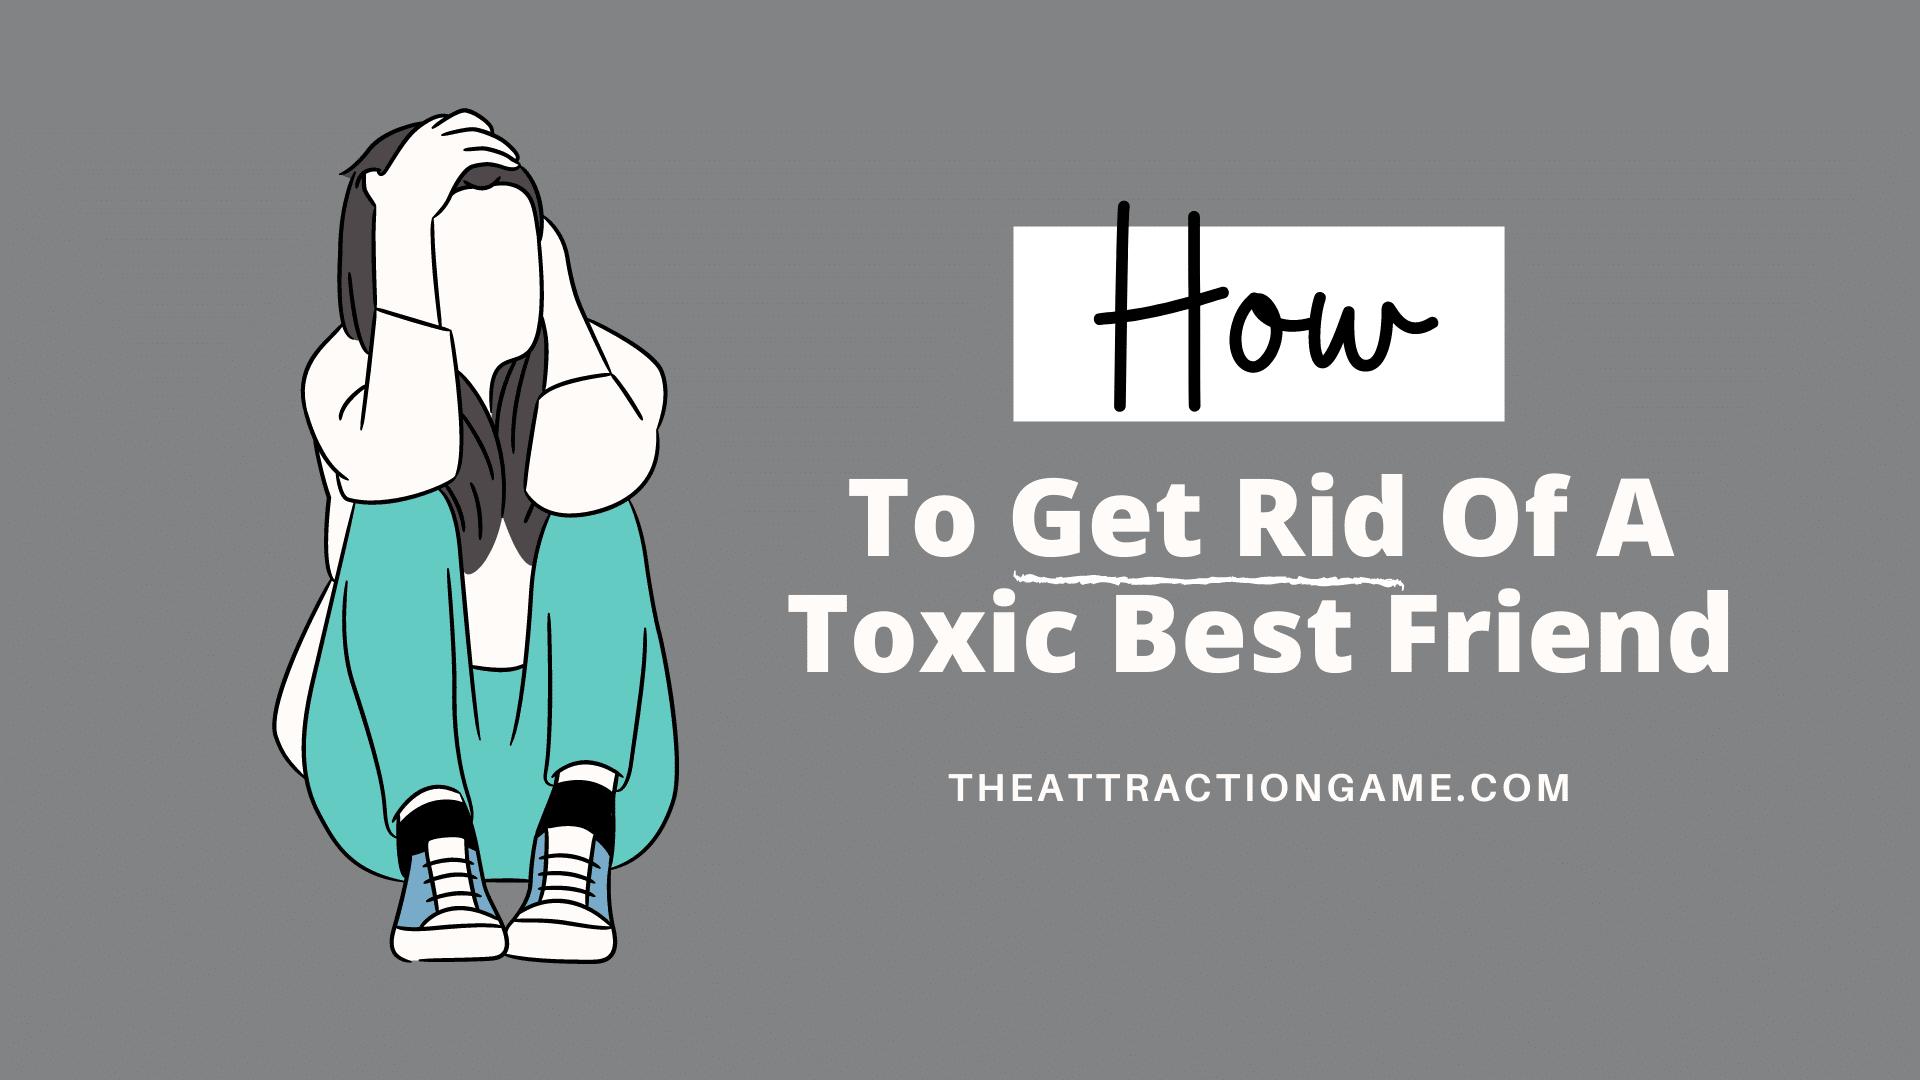 toxic best friend, get rid of toxic best friend, my best friend is toxic, how to end a toxic friendship